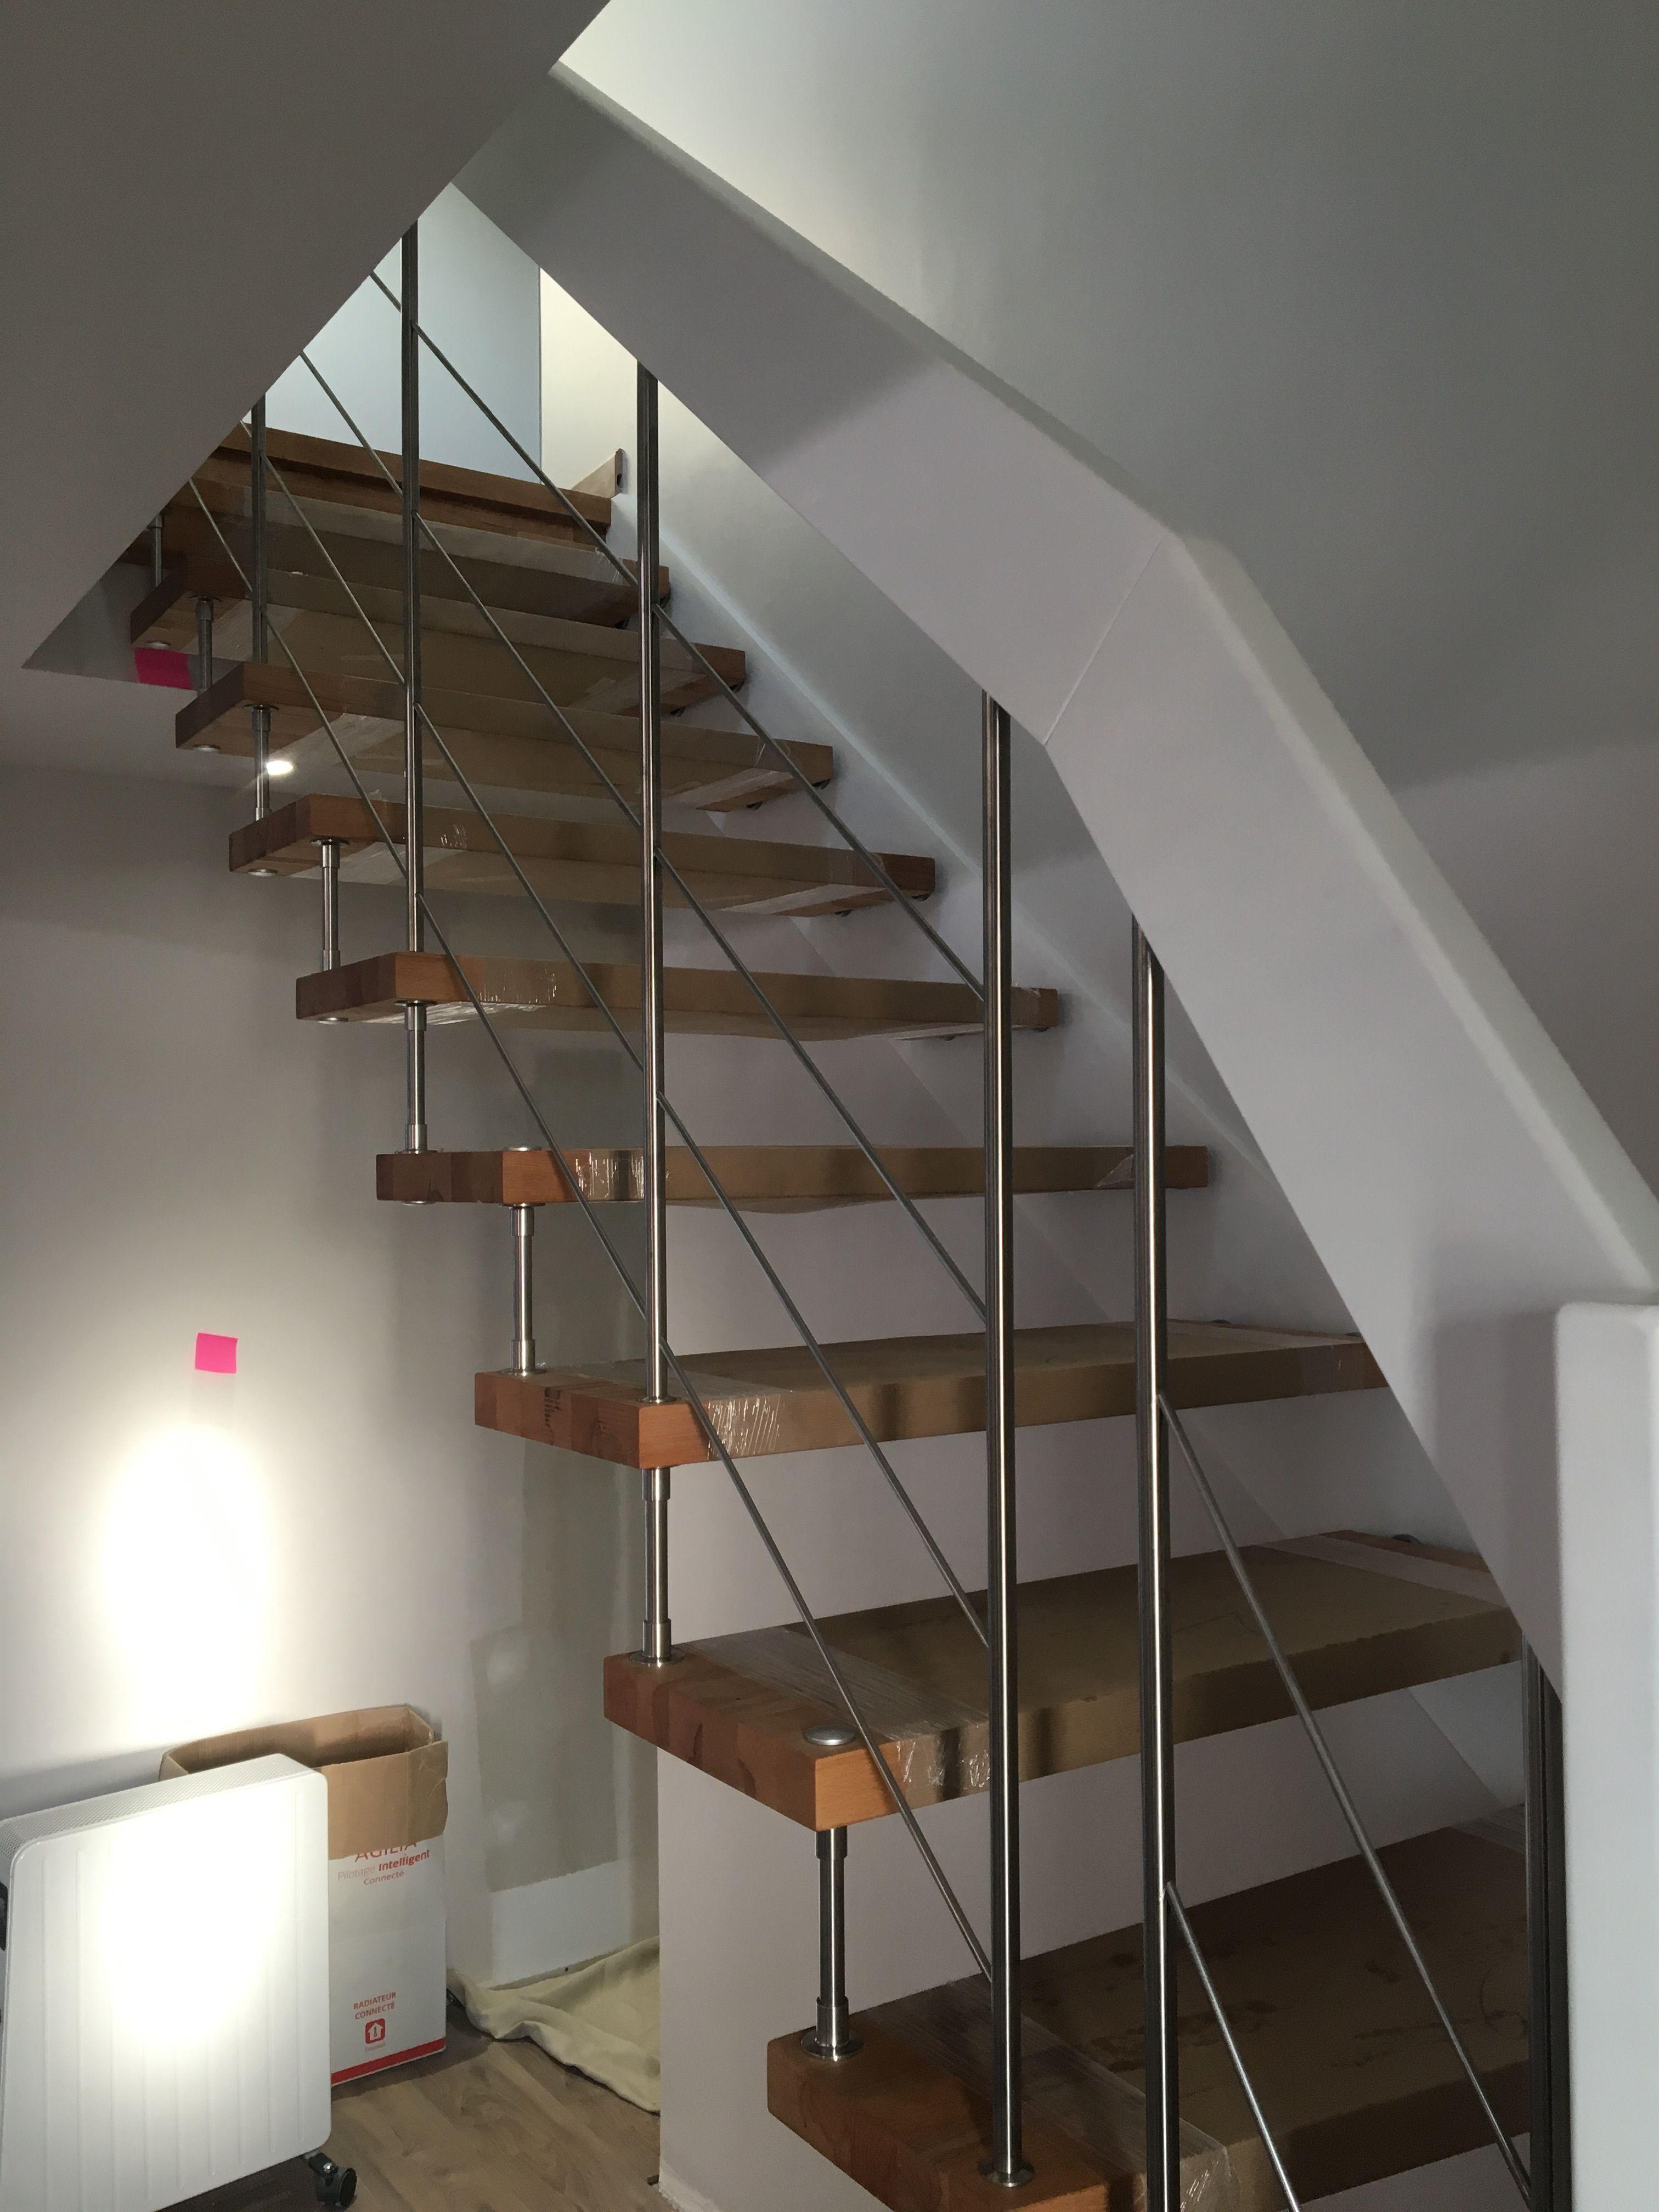 Escalier A Marches Suspendues Nova R6 Avec Main Courante Blanche